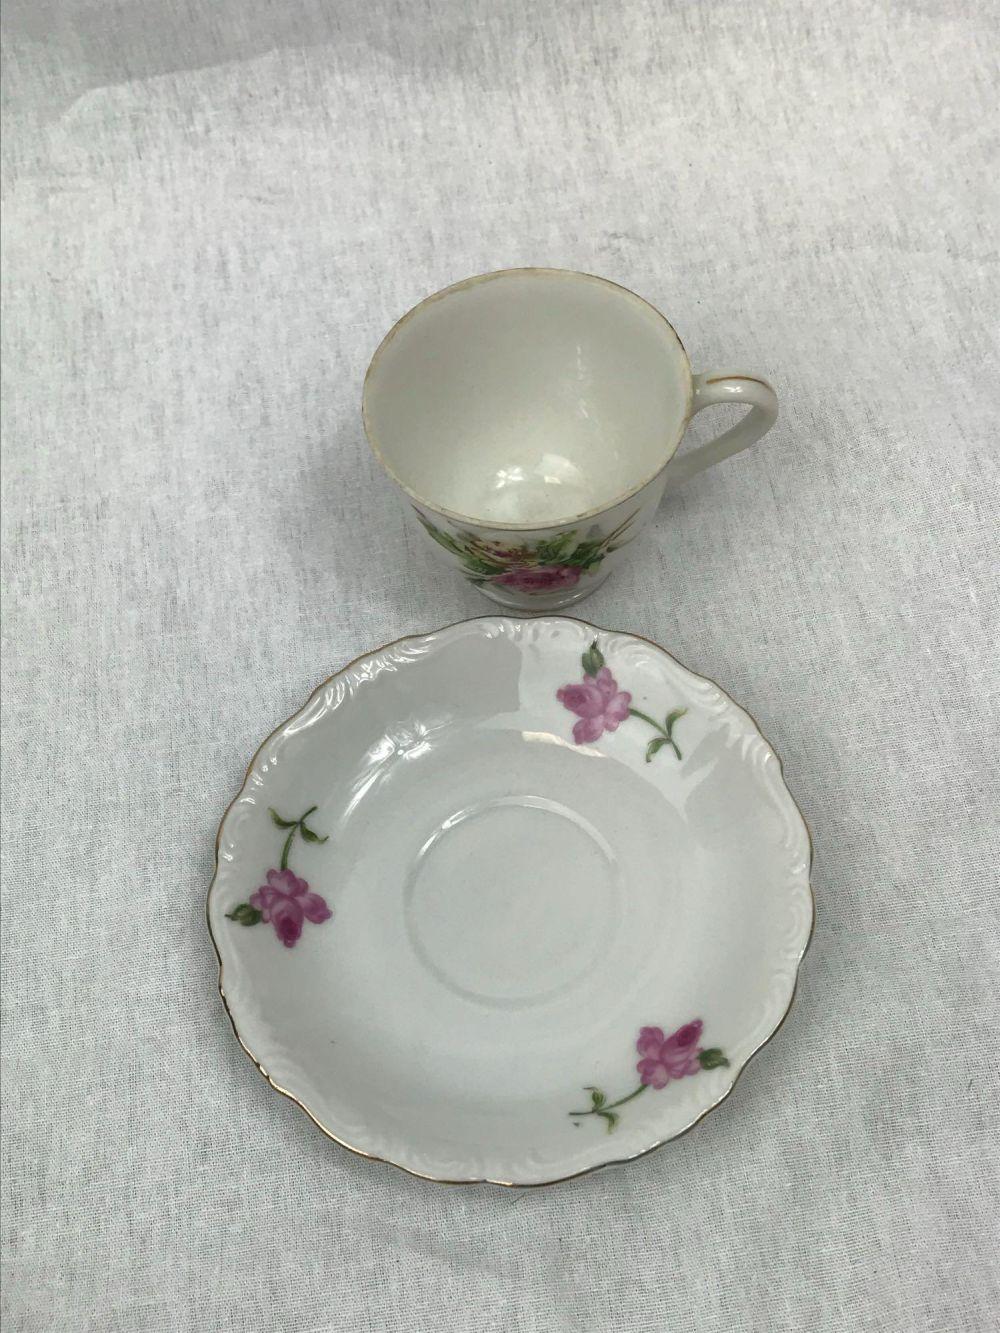 Lot 941: 4 Porcelain Tea Cups and Saucers